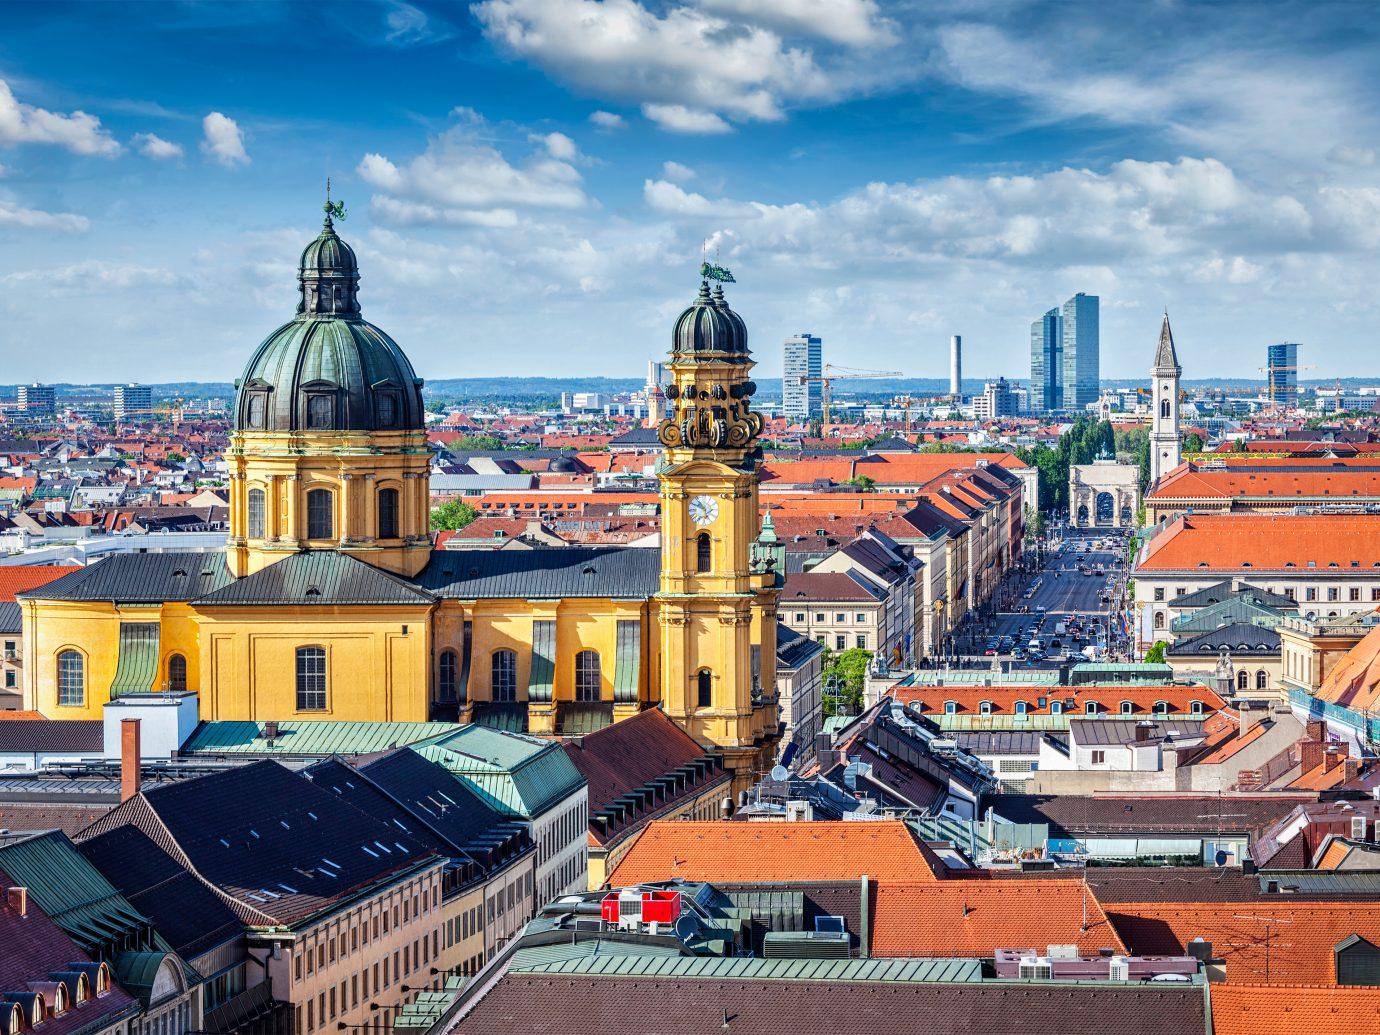 Aerial view of Munich over Theatine Church of St. Cajetan